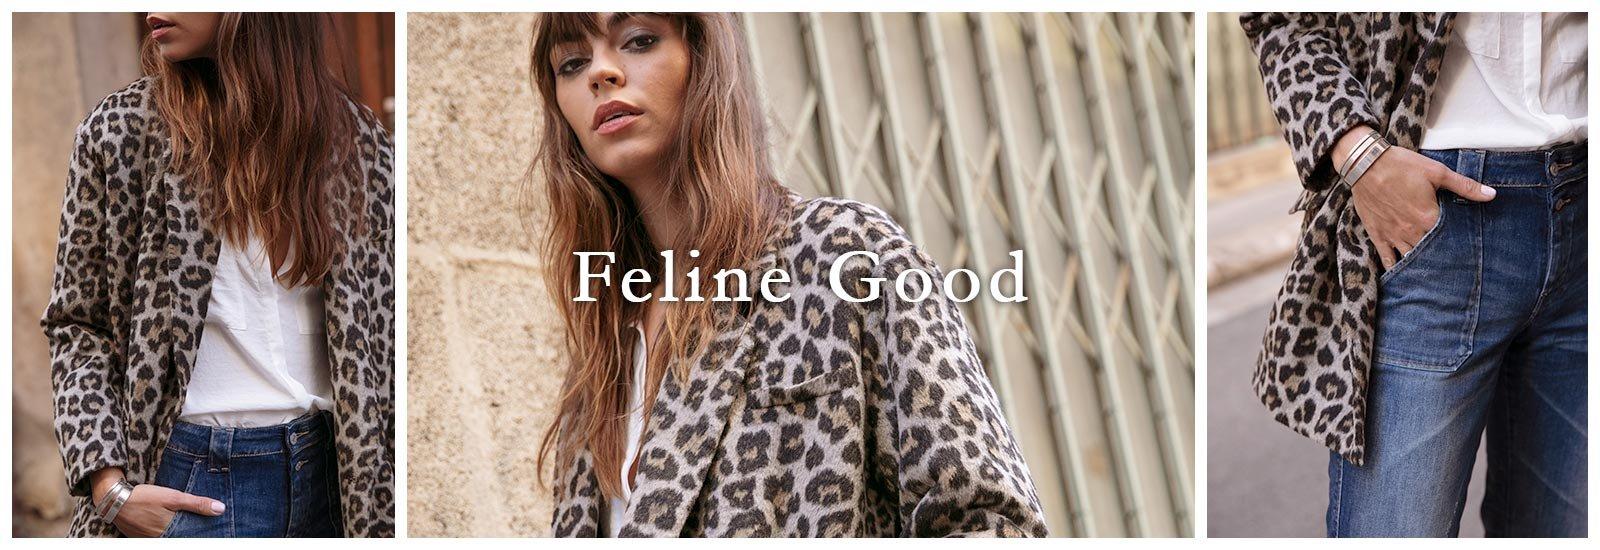 Feline Good